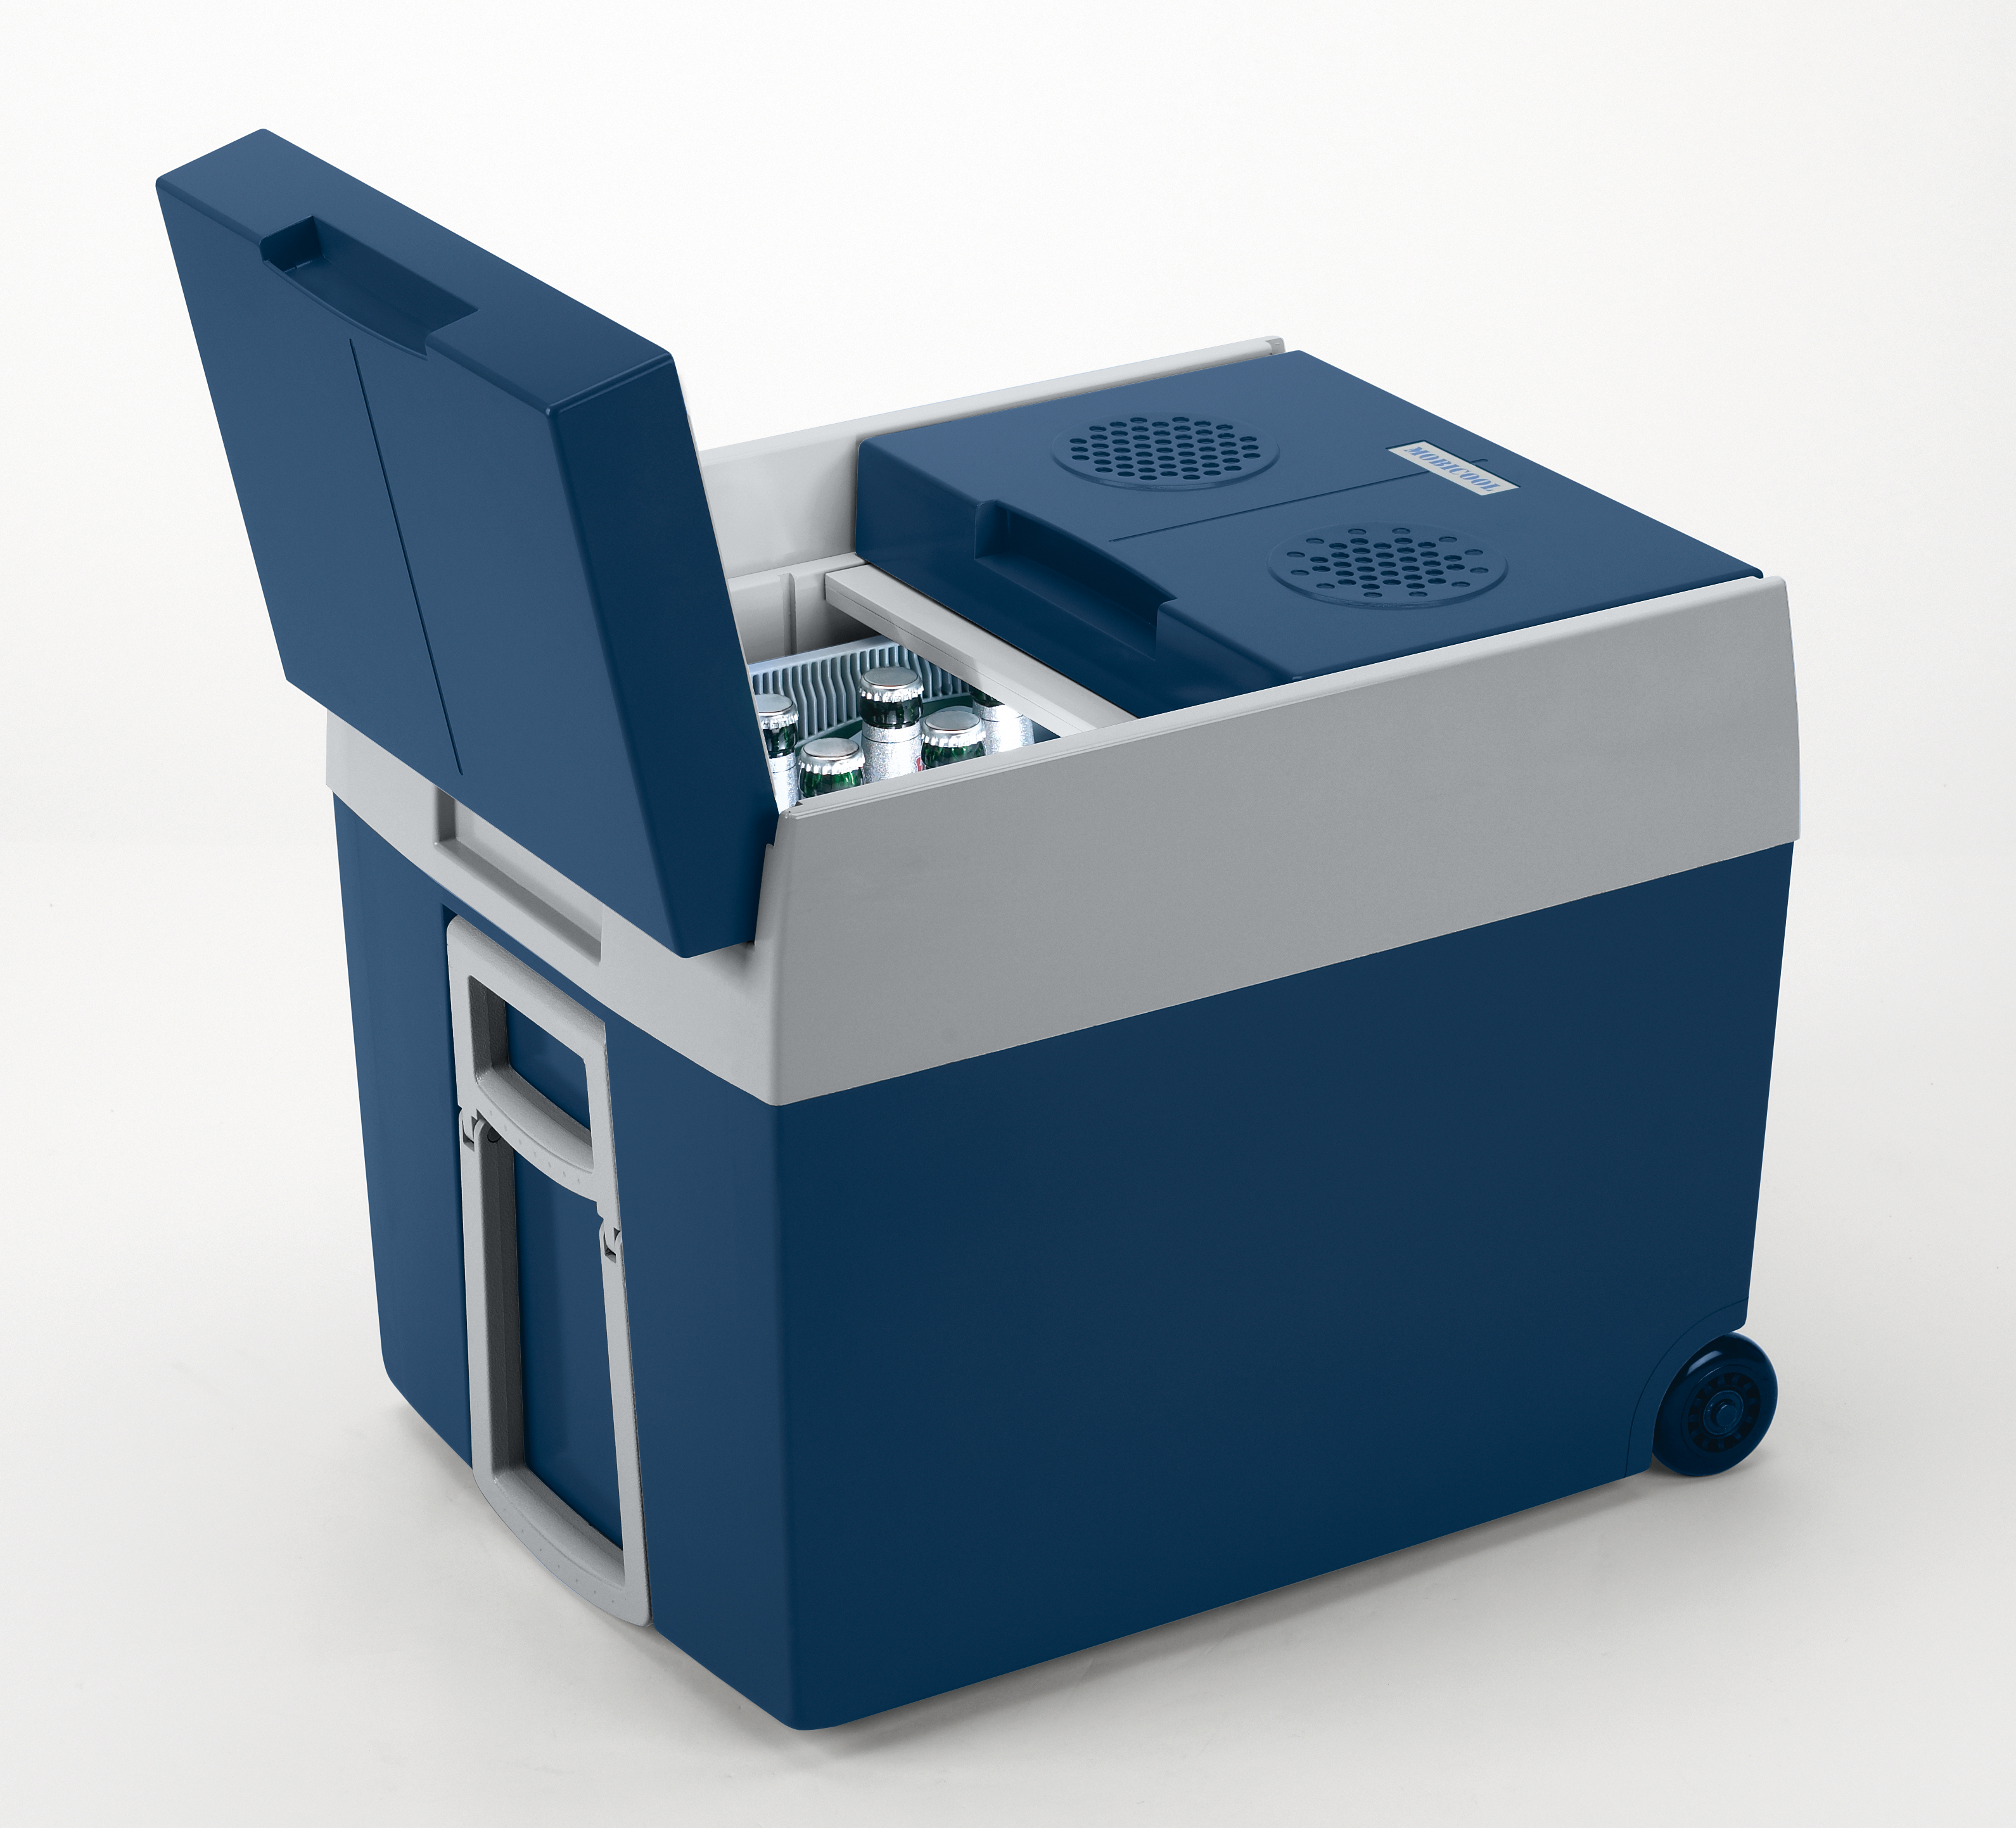 48 l mobicool w48 elektrische kühlbox, blaumetallic – 12/230 v